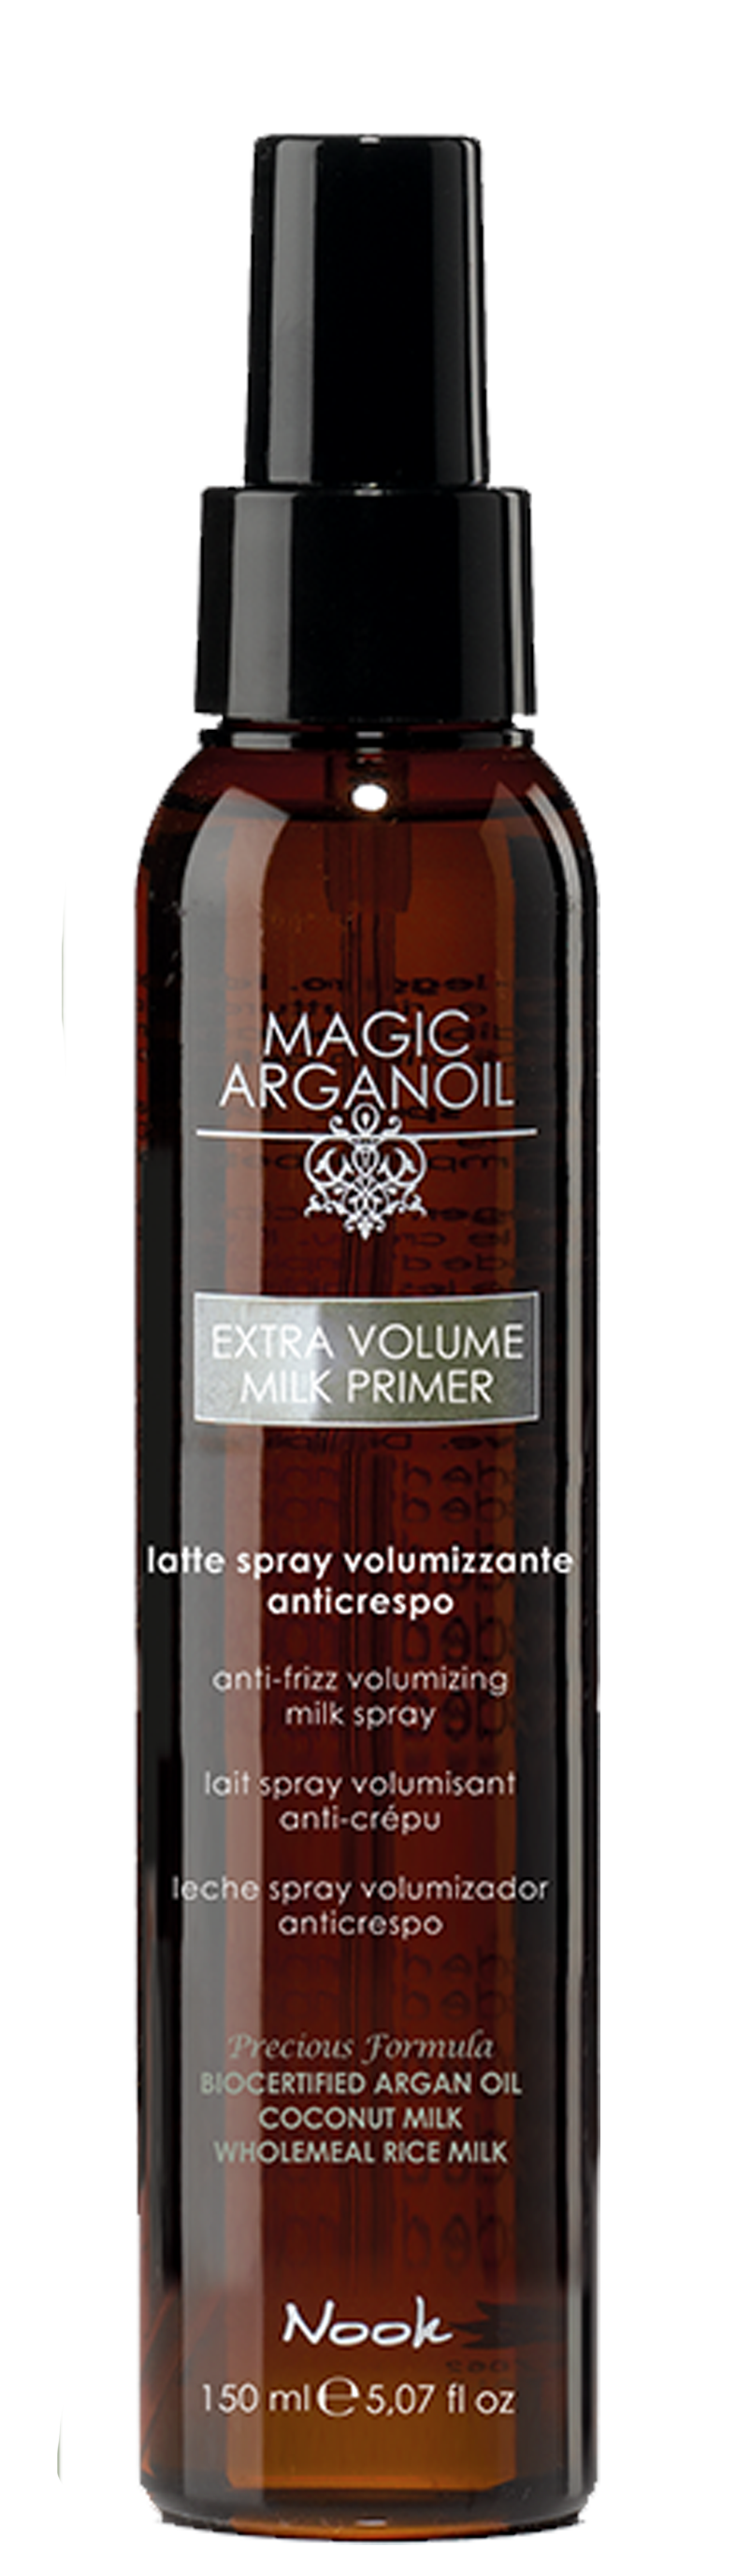 27015 extra volume milk primer 150 + ast